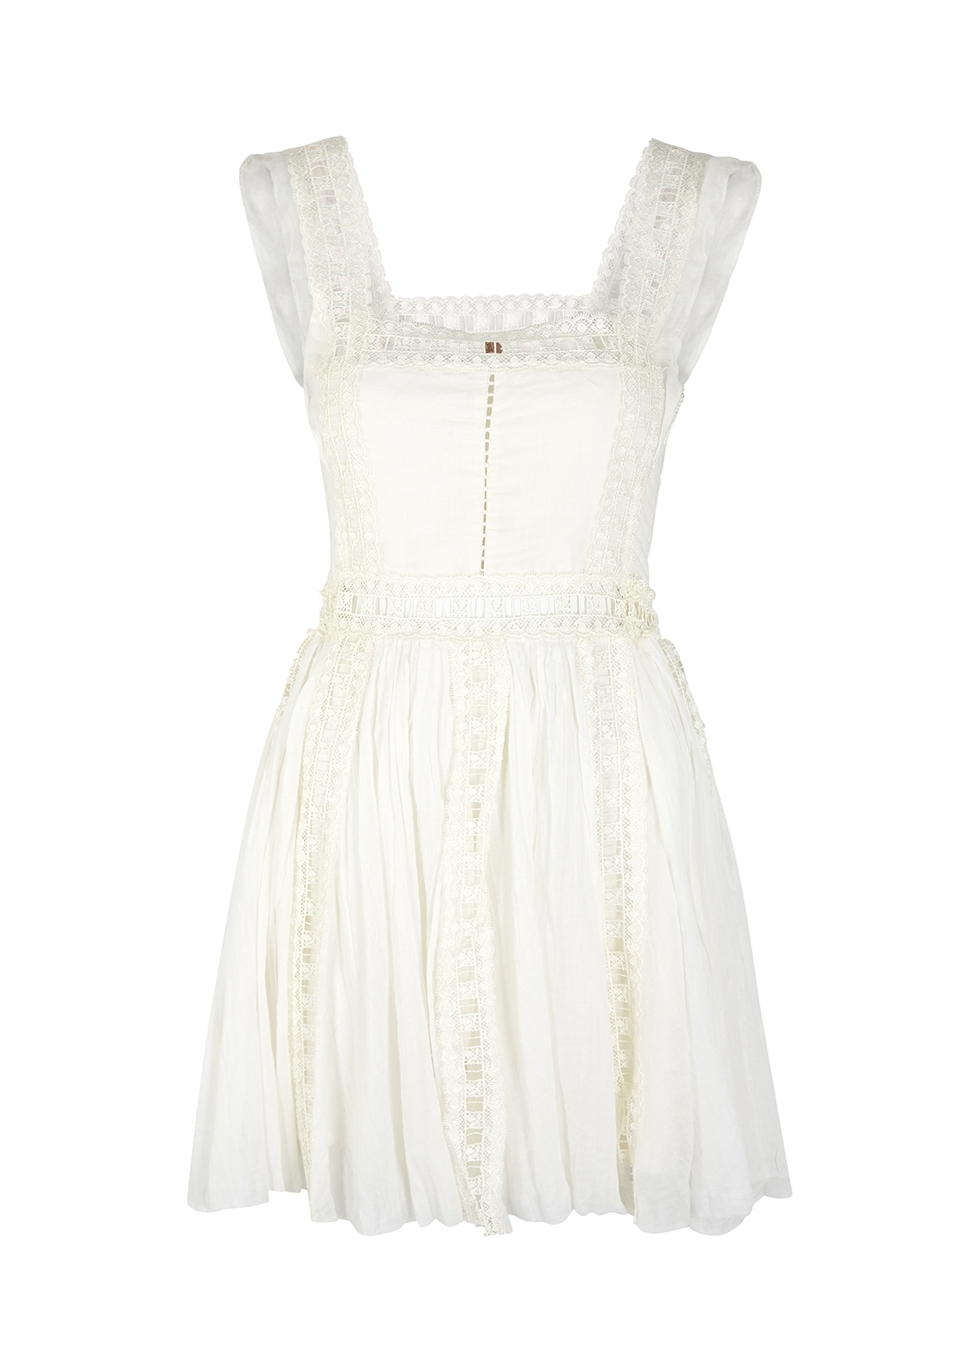 88f94b94 Designer Dresses & Designer Gowns - Harvey Nichols